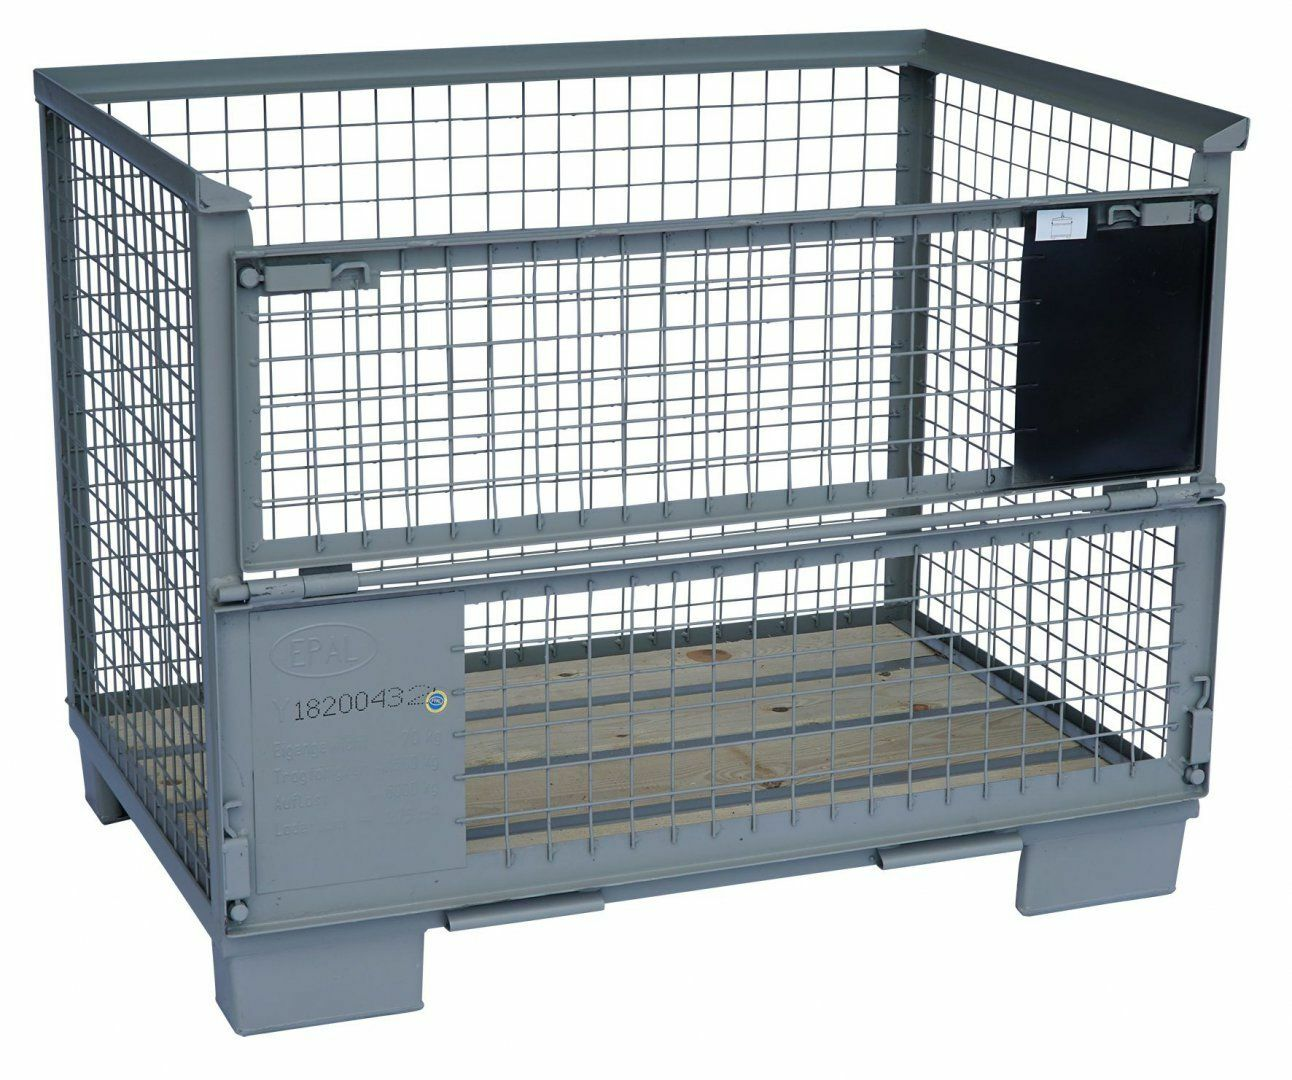 gitterboxen g nstig kaufen padberg palatec shop. Black Bedroom Furniture Sets. Home Design Ideas